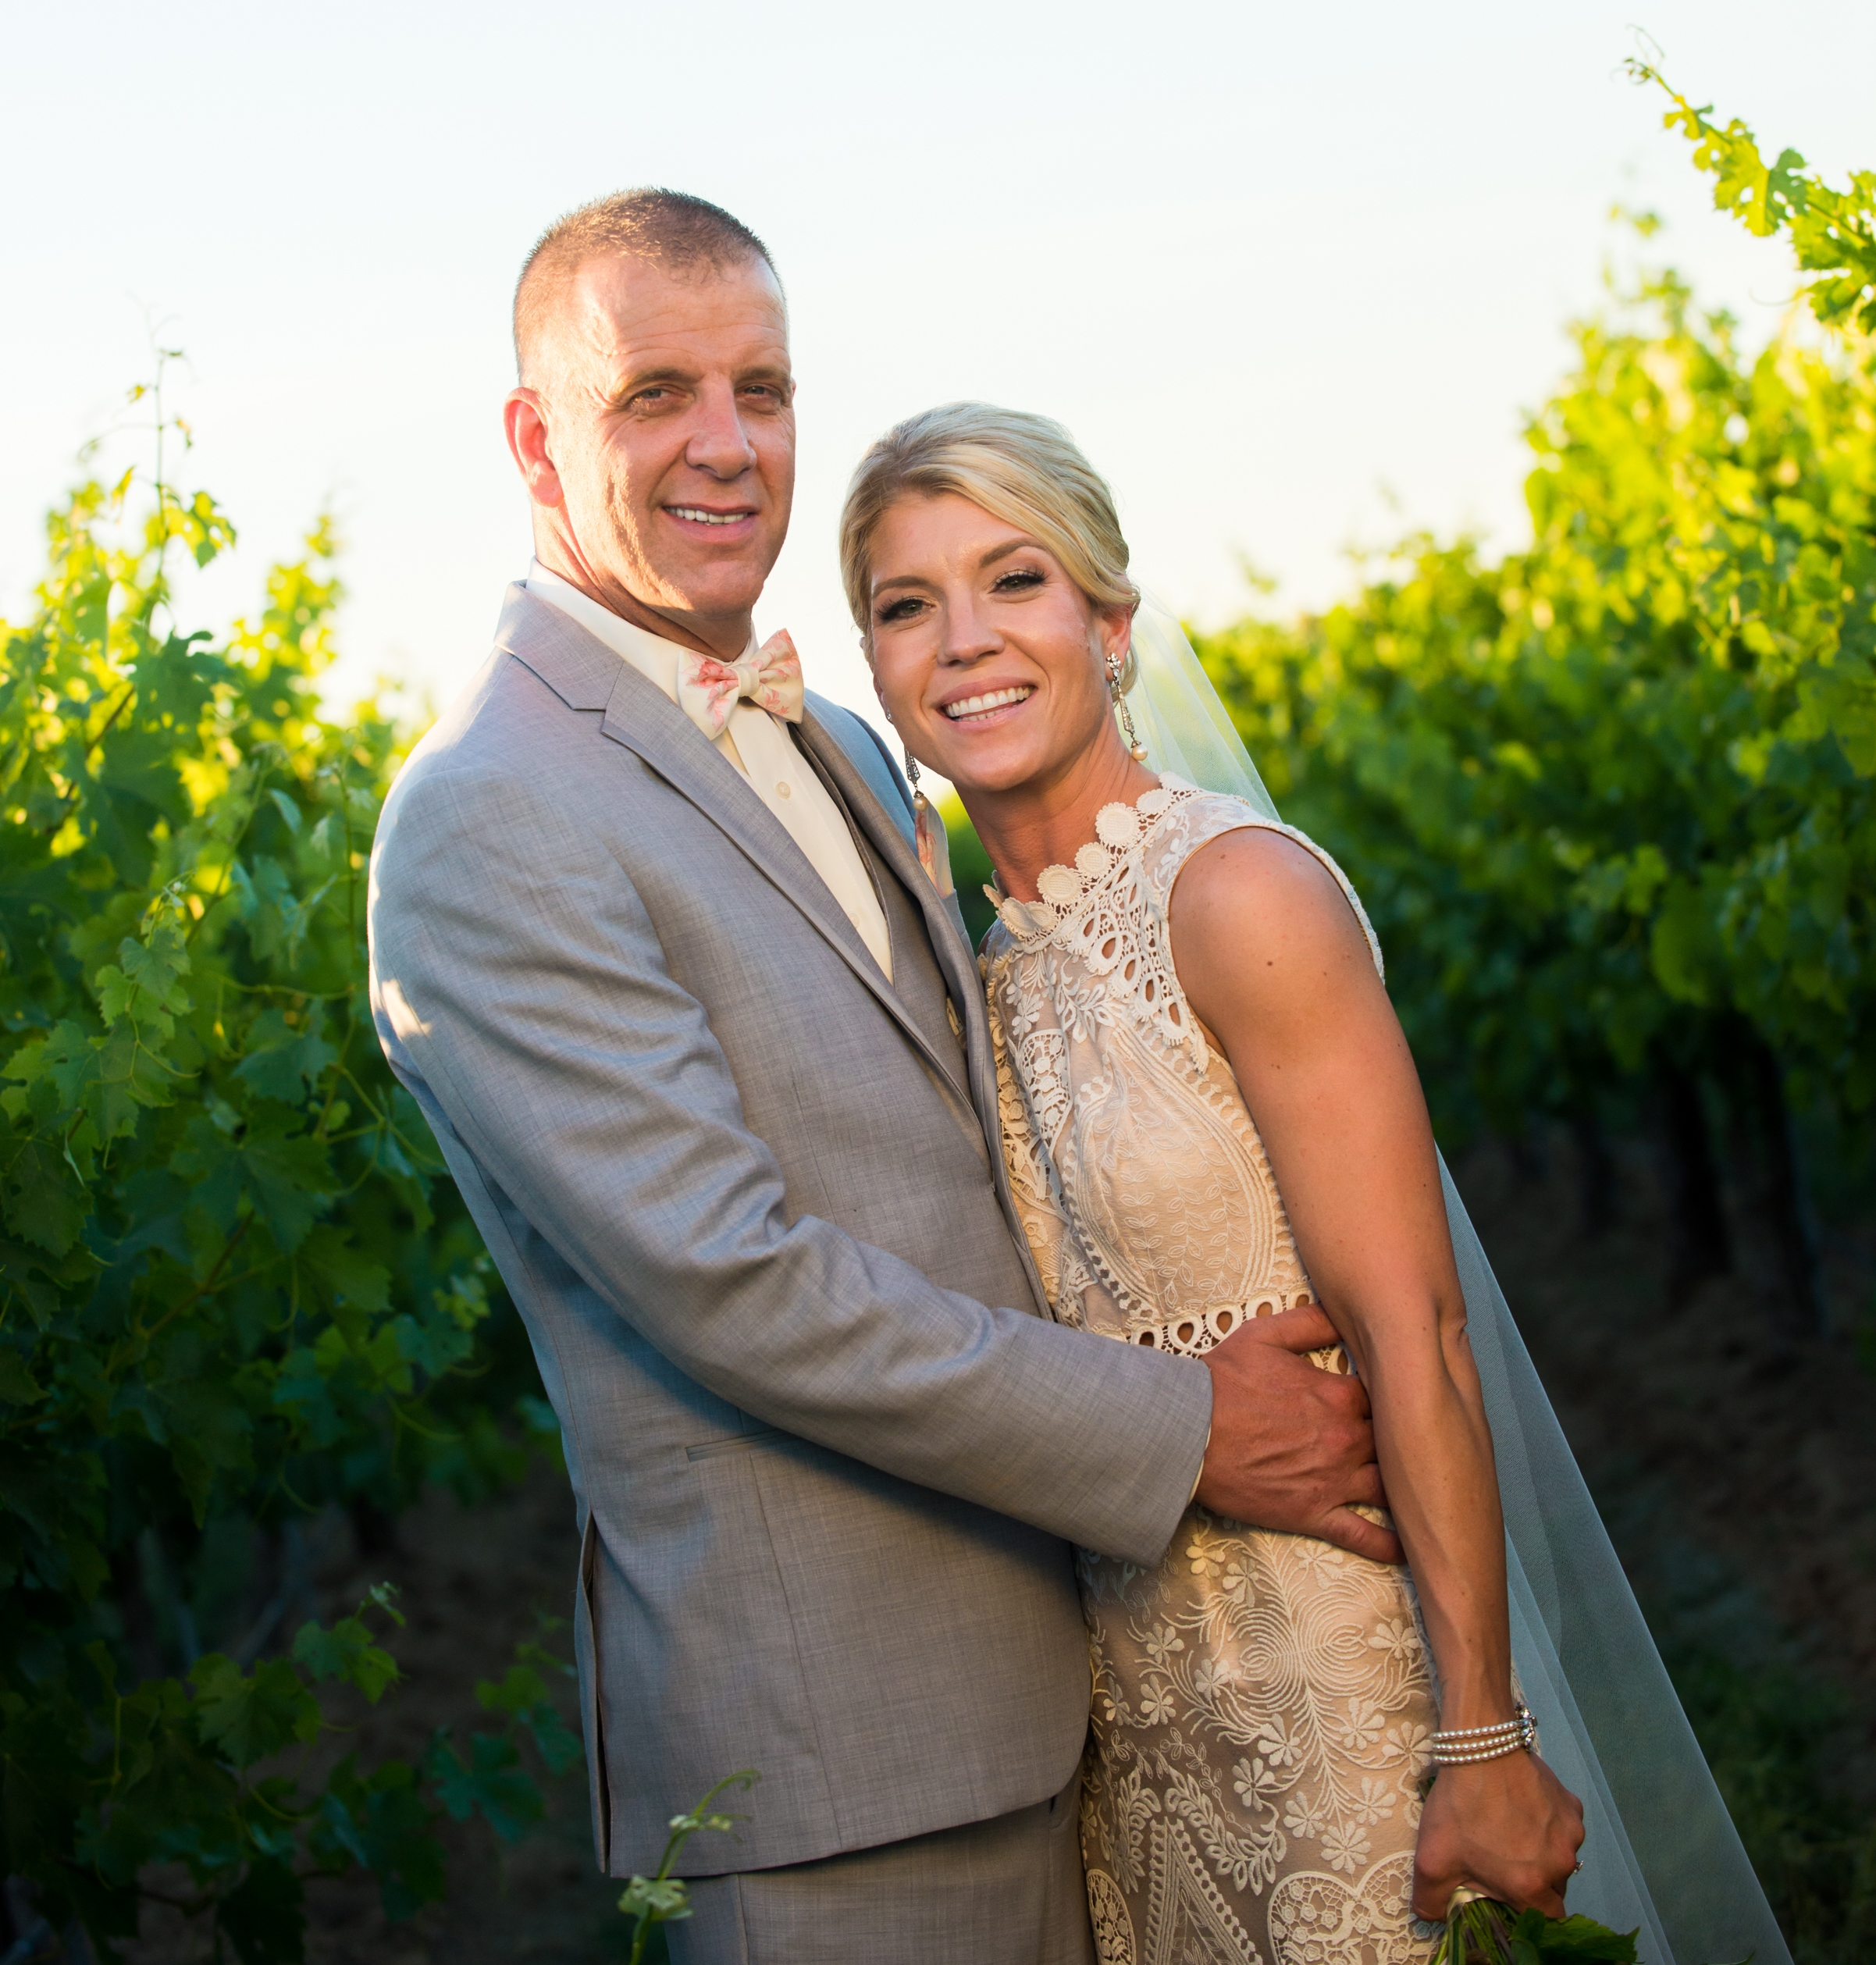 Kelly & Thomas | Goose Ridge Winery